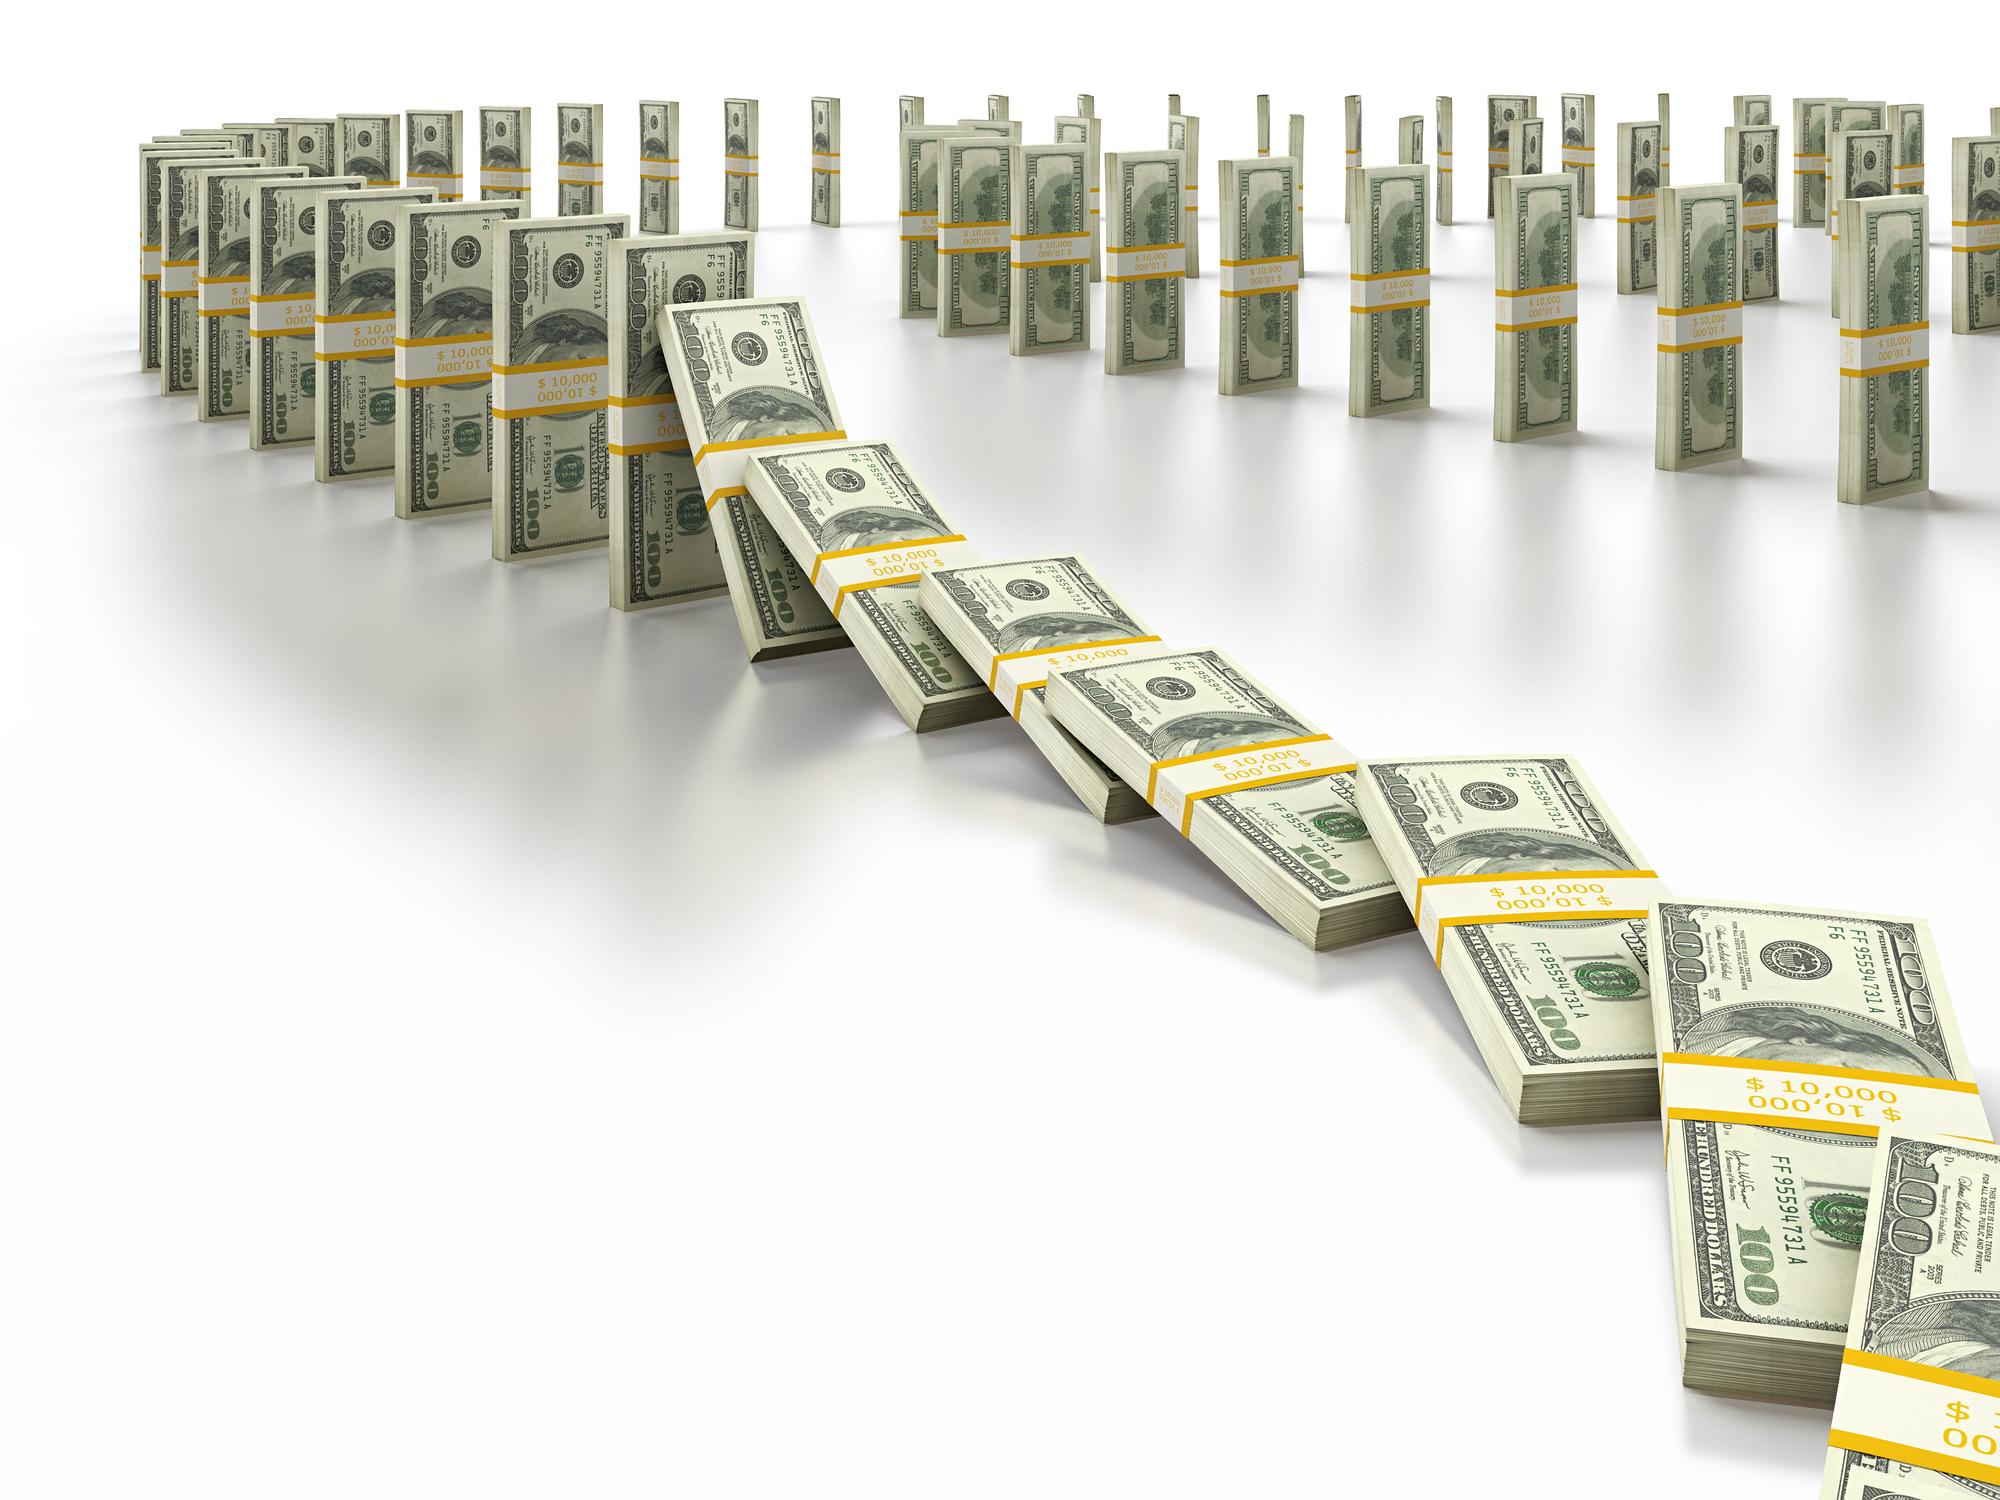 Stacks of money falling like dominoes